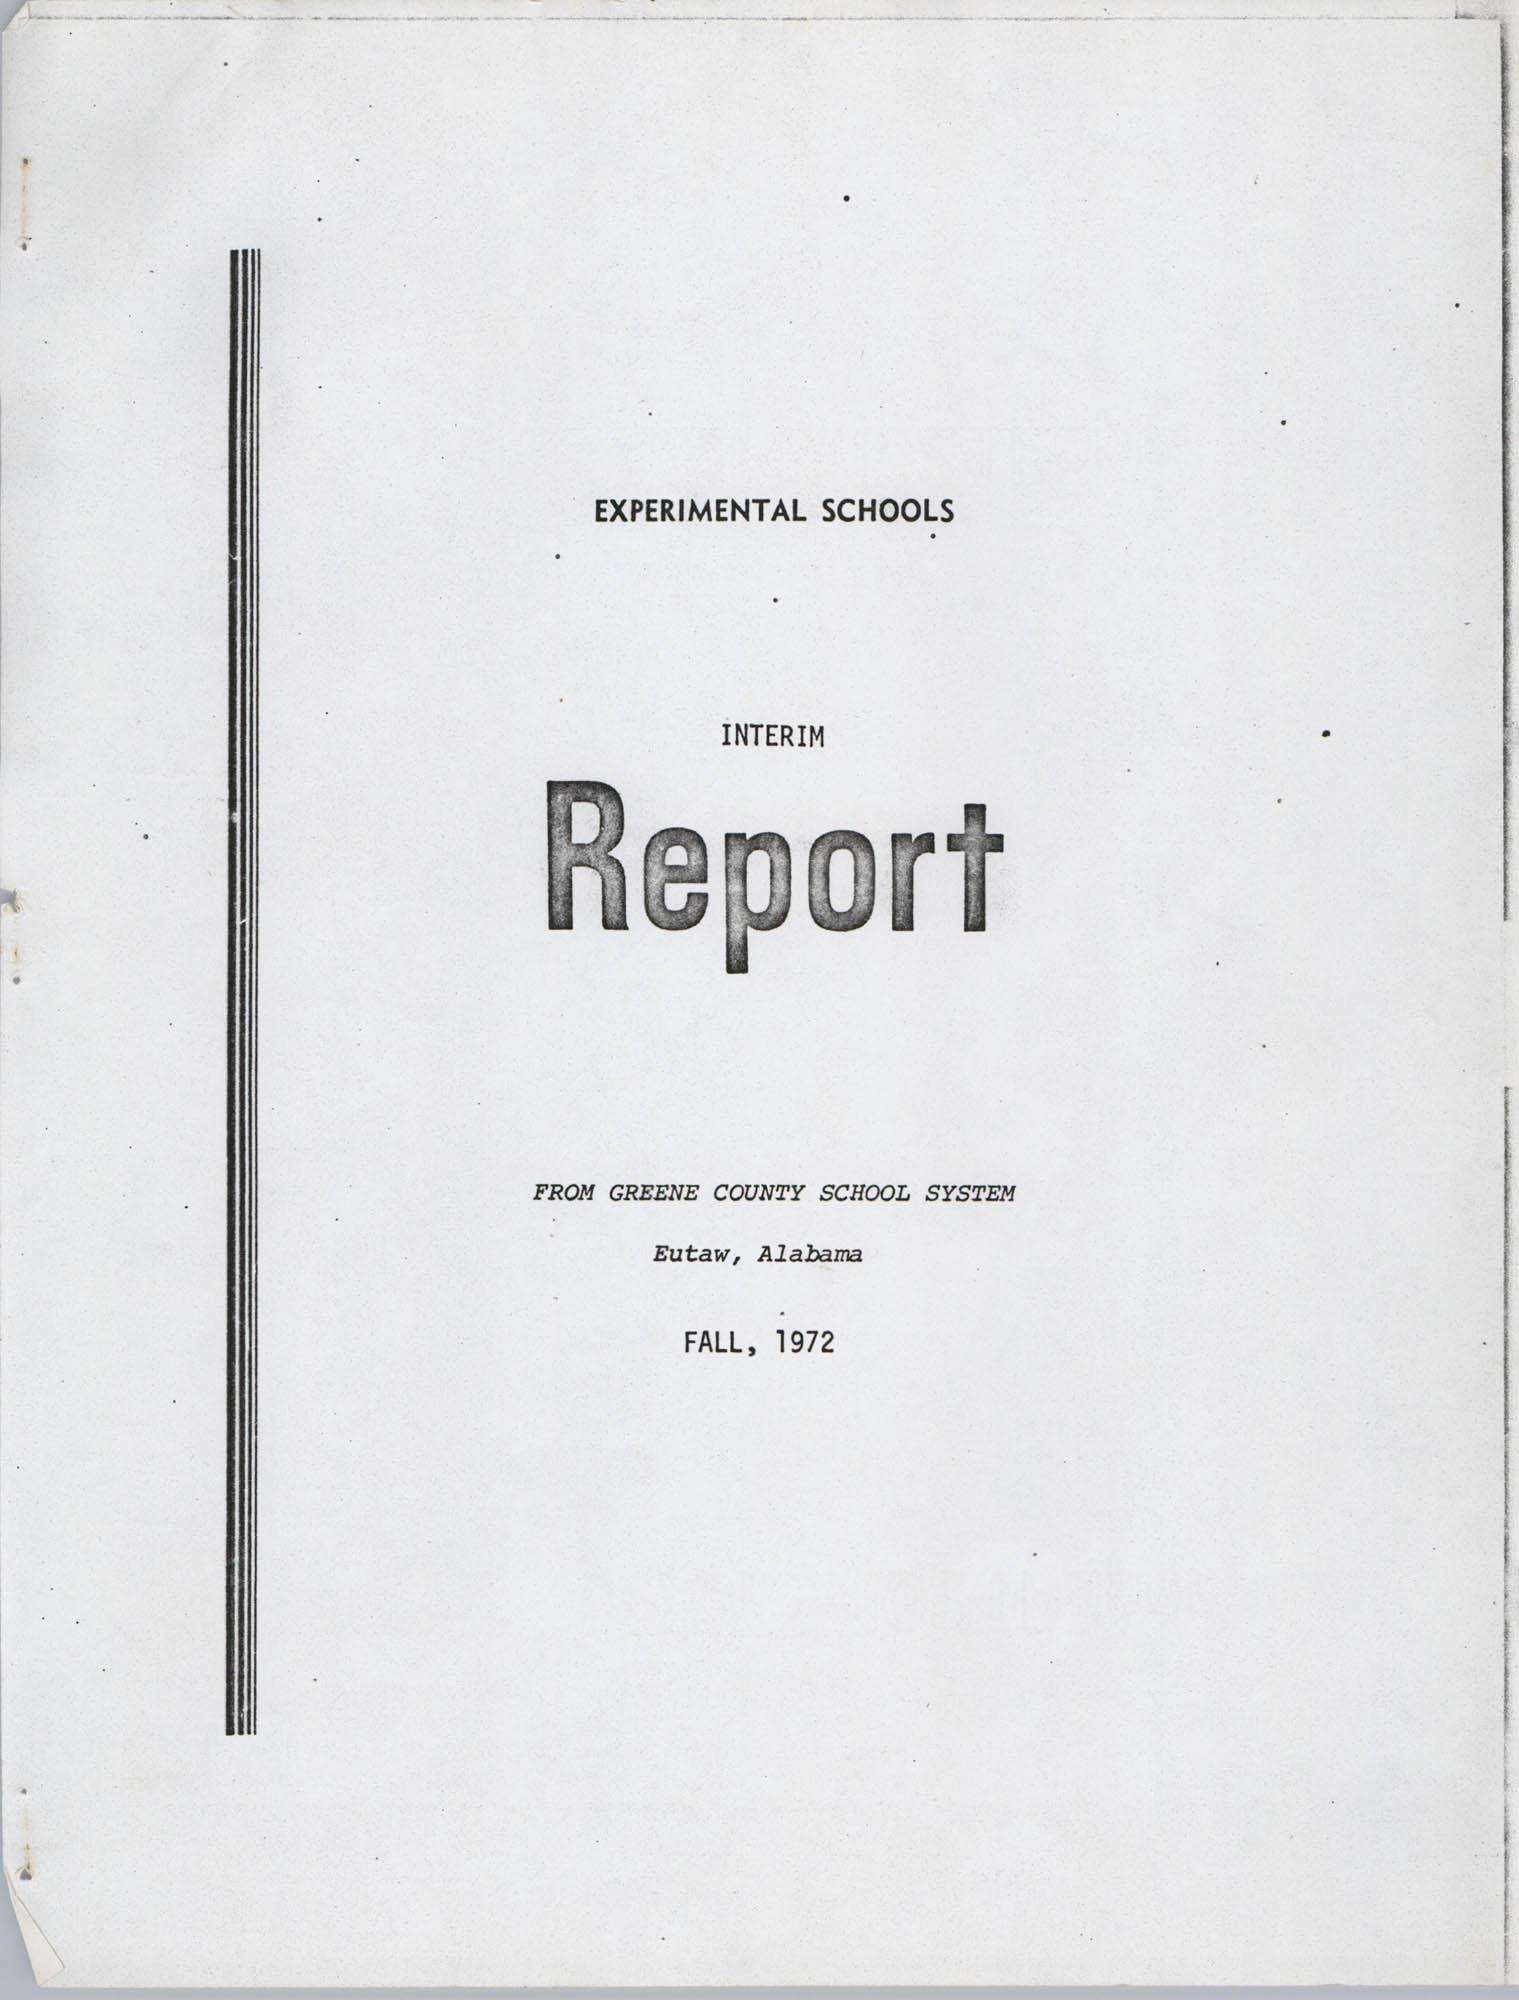 Experimental Schools Interim Report, Greene County School System, Cover Page